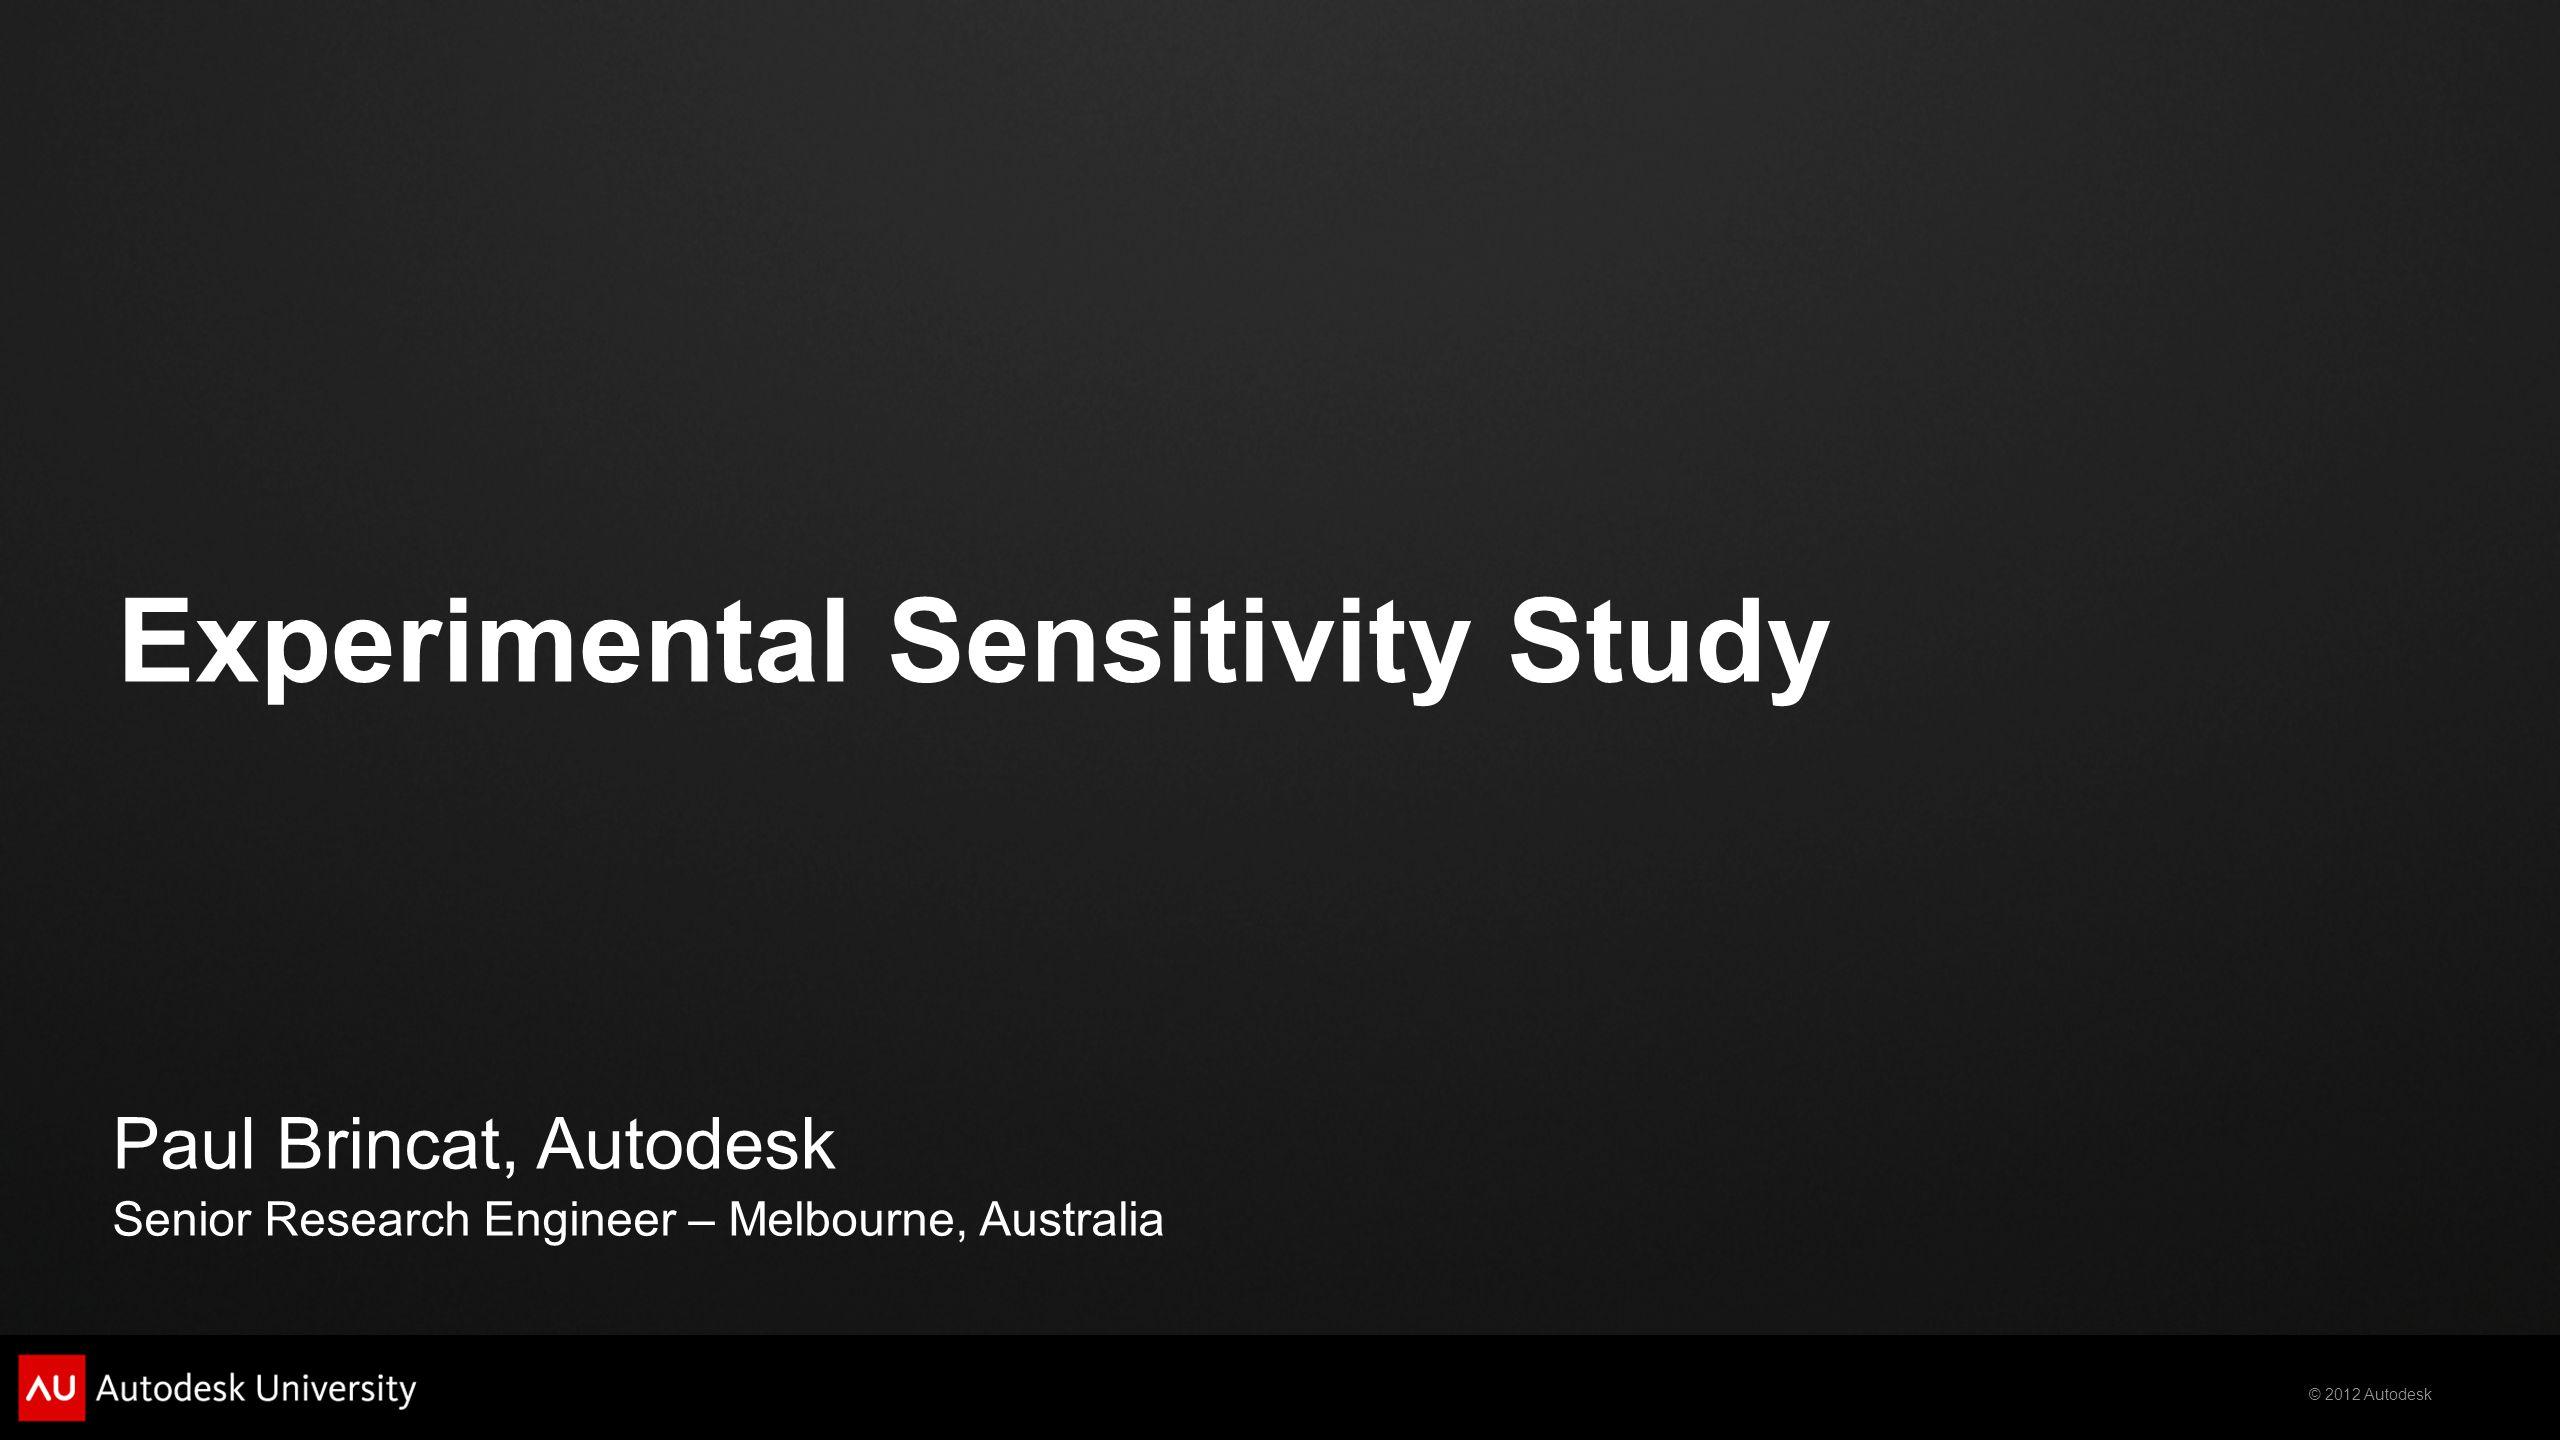 © 2012 Autodesk Experimental Sensitivity Study Paul Brincat, Autodesk Senior Research Engineer – Melbourne, Australia